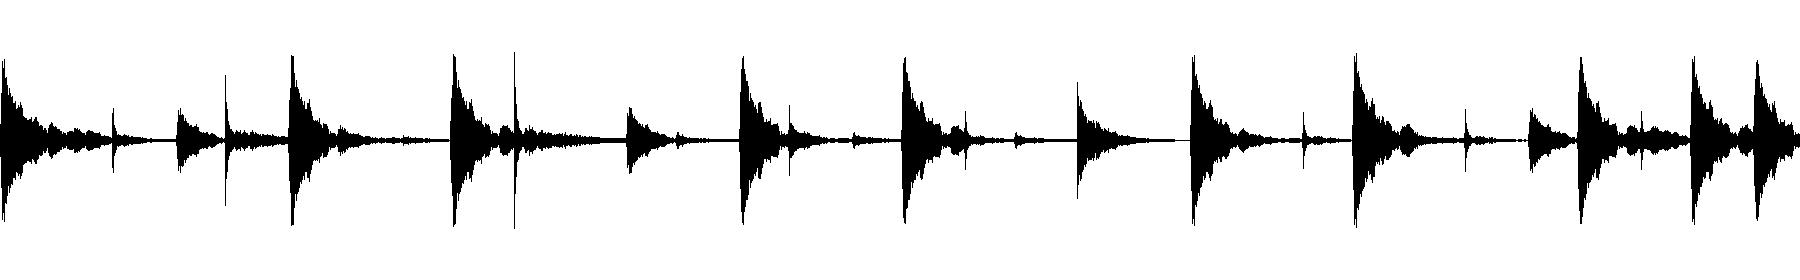 g abs05 070